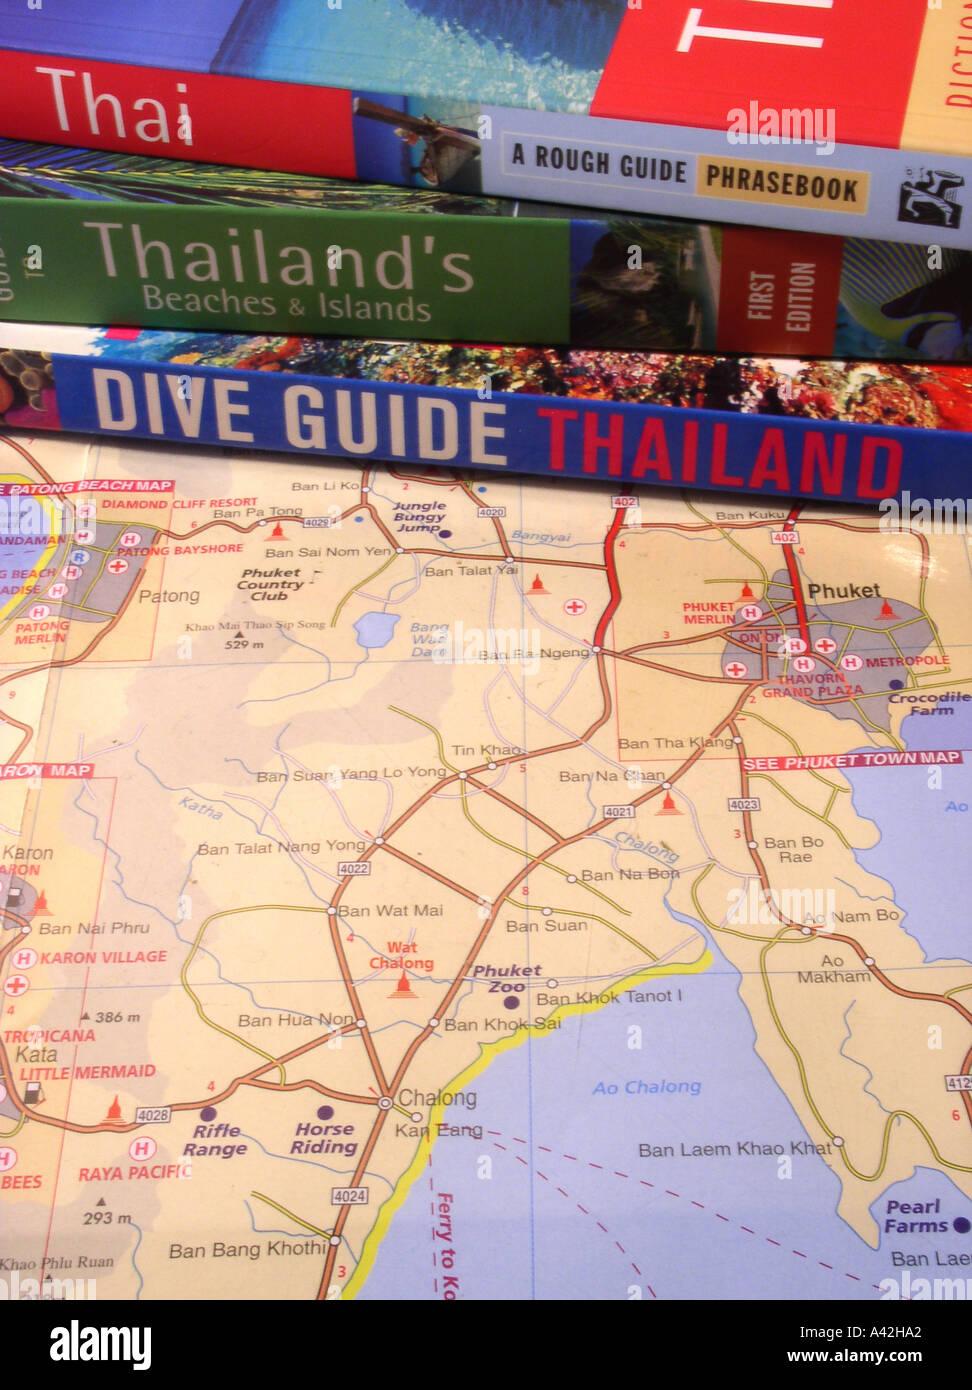 Tourist Map Of Florida.Florida Guide Guidebooks Carl Hiaasen Novel Tourist Season Map Of